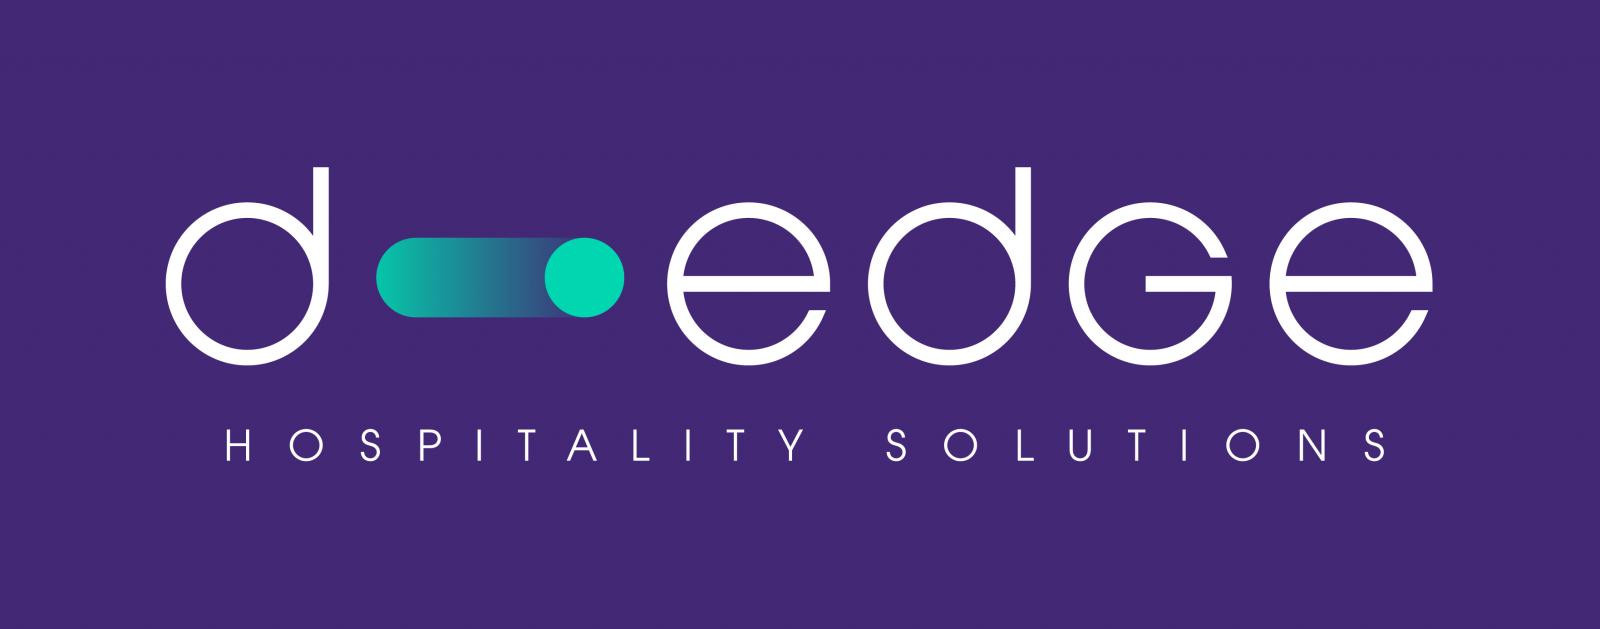 D-EDGE Hospitality Solutions